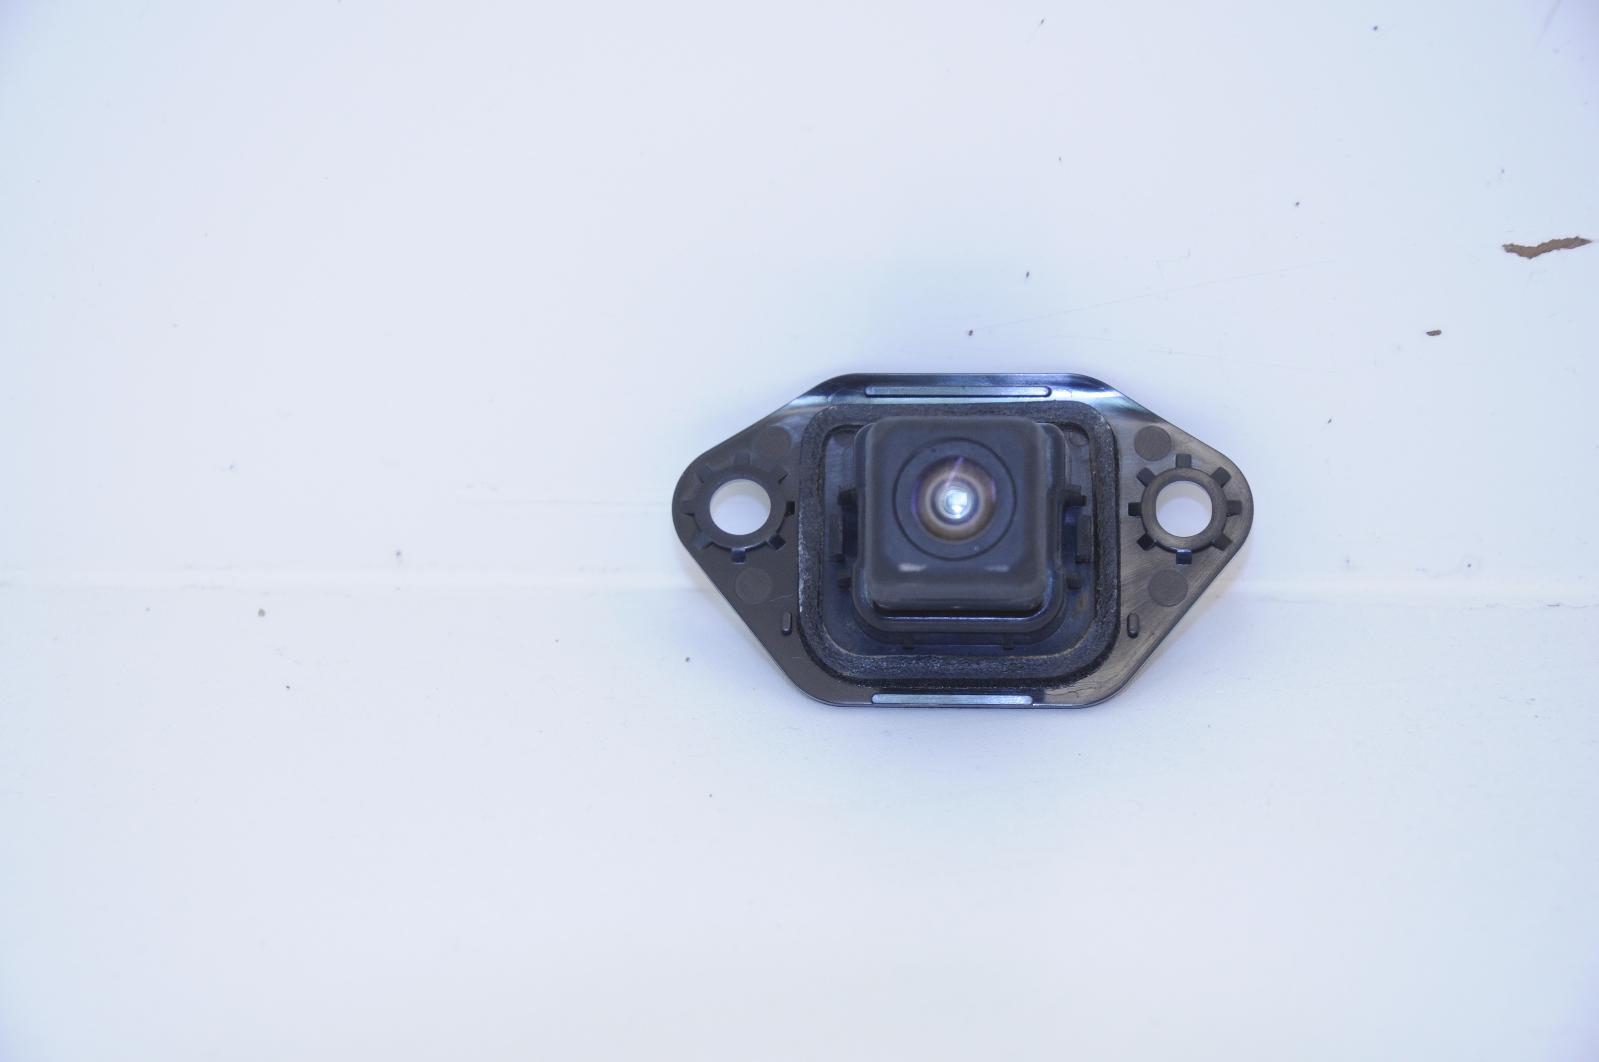 2005 Toyota Avalon Backup Camera